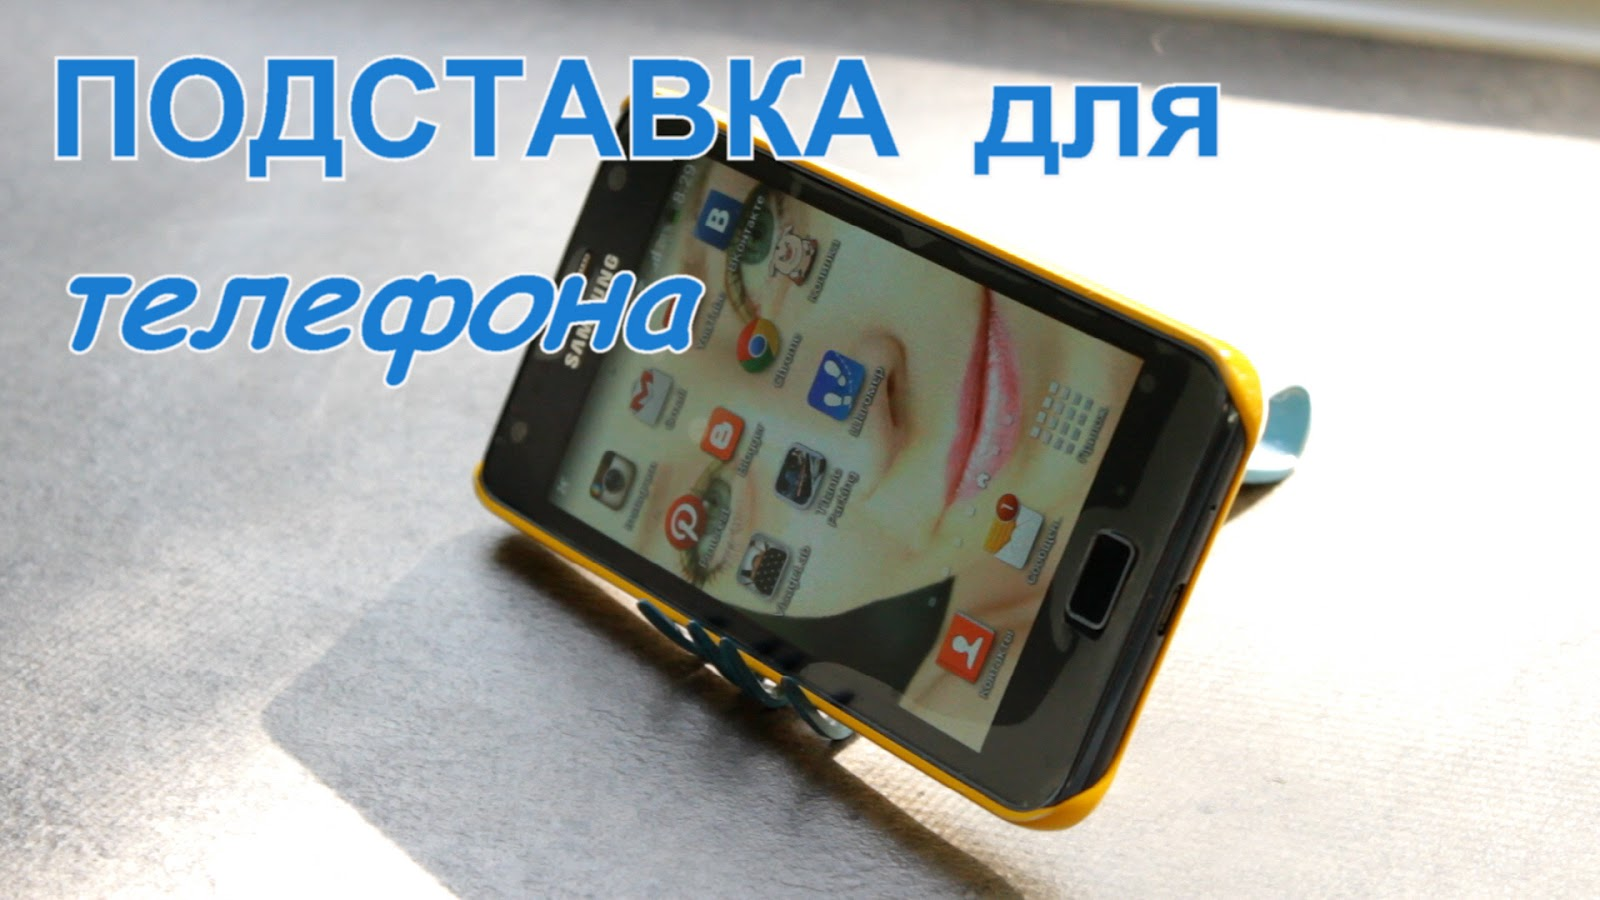 Подставка под смартфон своими руками фото 487